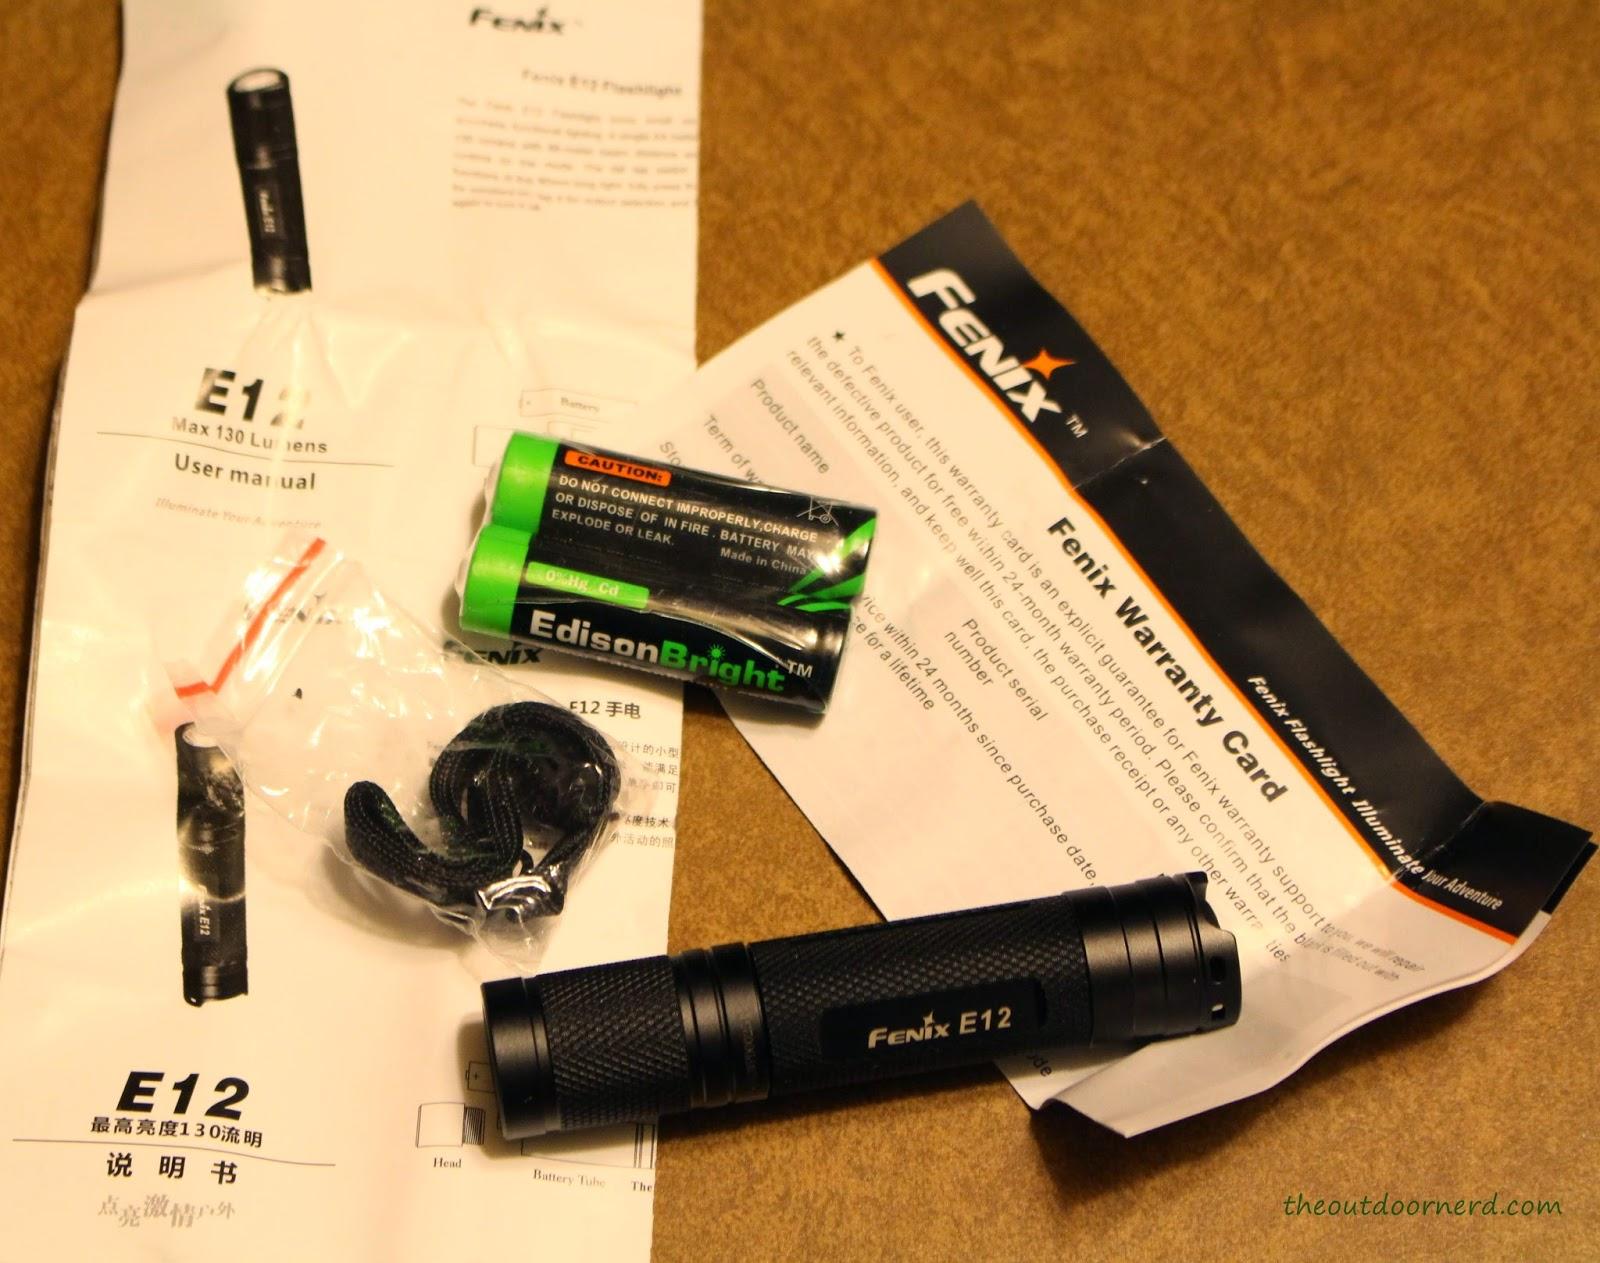 Fenix E12 1xAA EDC Flashlight Packaging 4